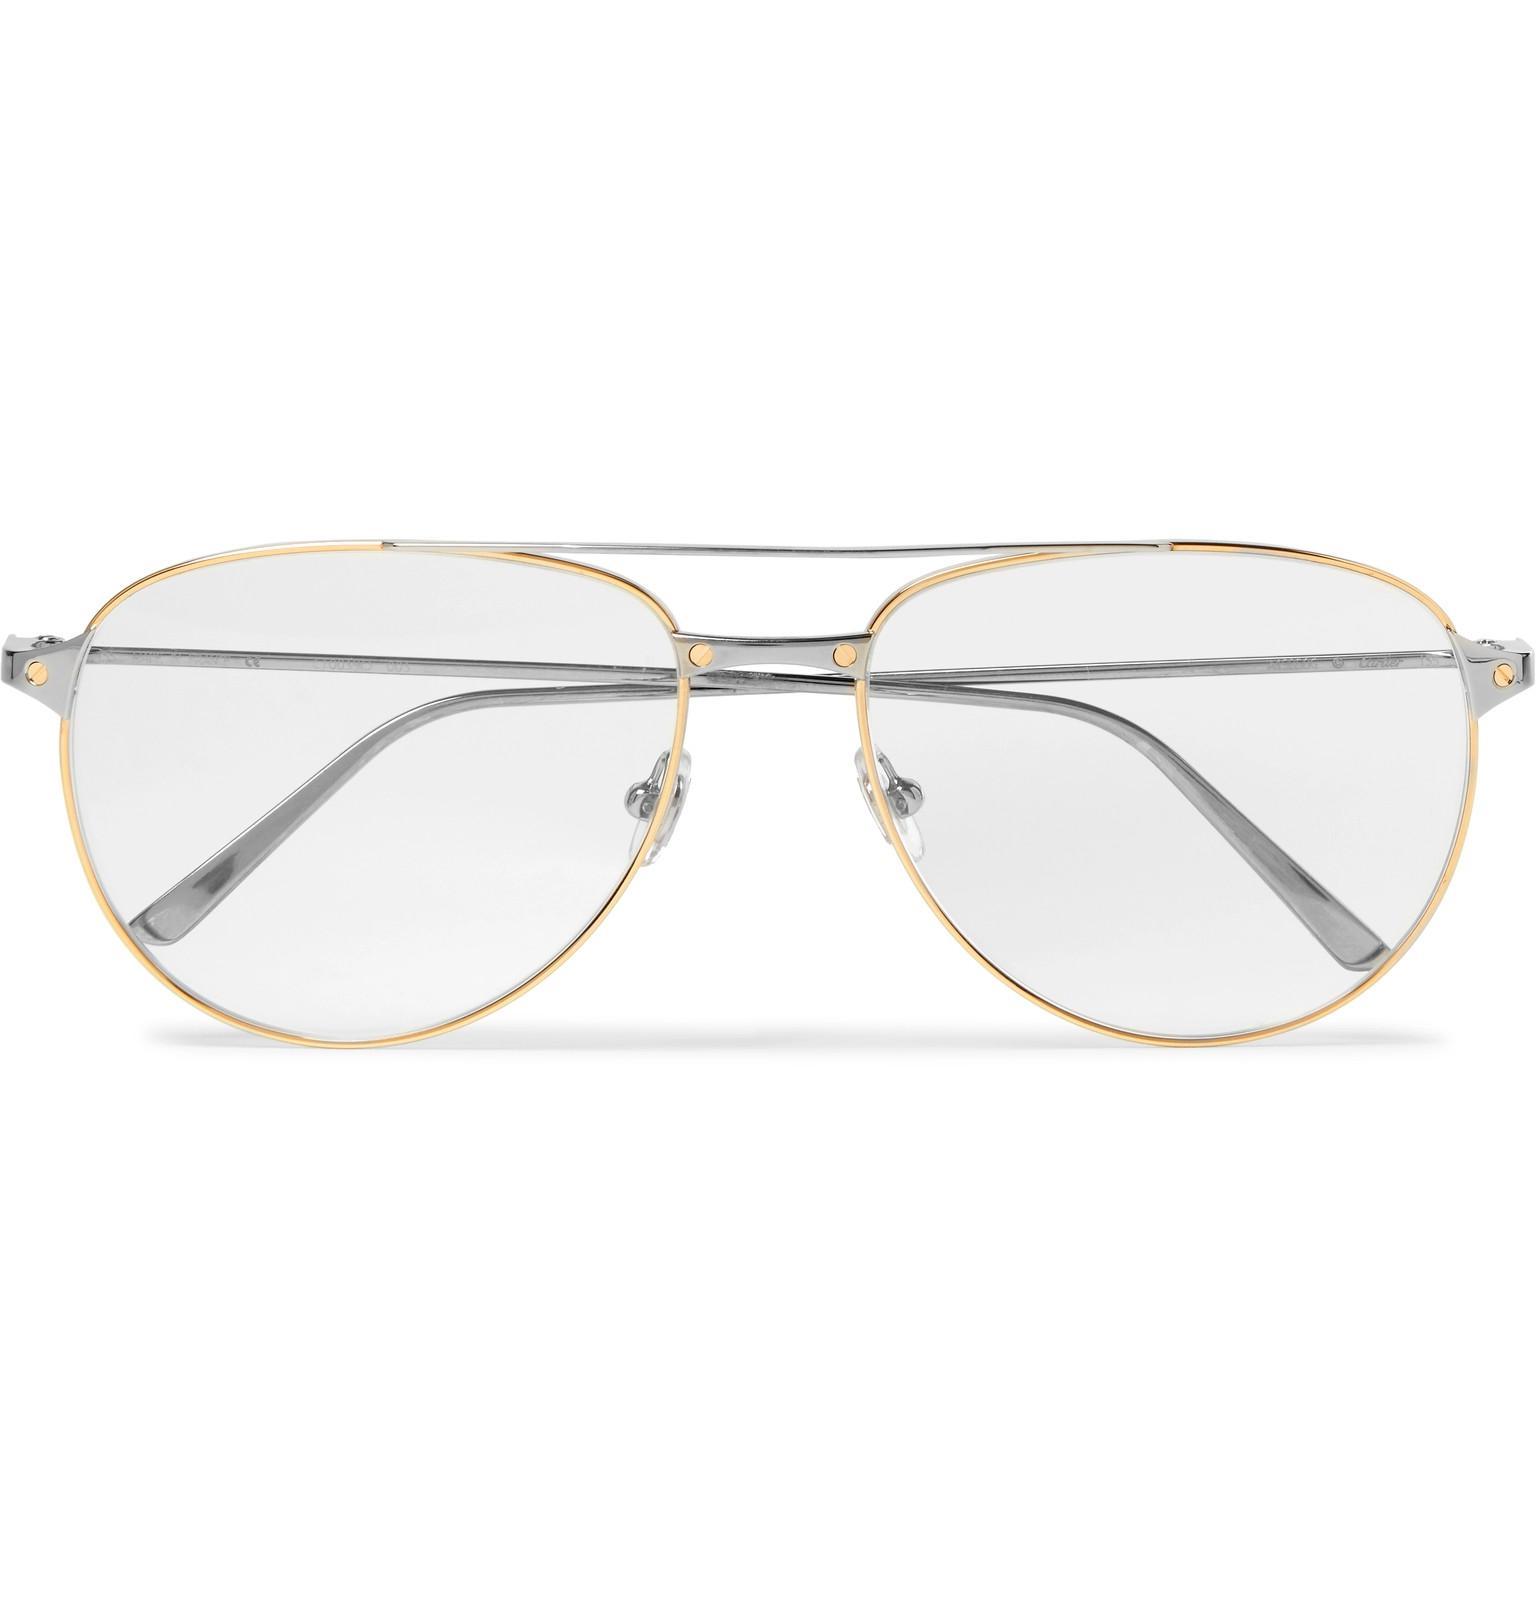 0cacf339ea8 Cartier Santos De Cartier Aviator-style Gold And Silver-tone Glasses ...